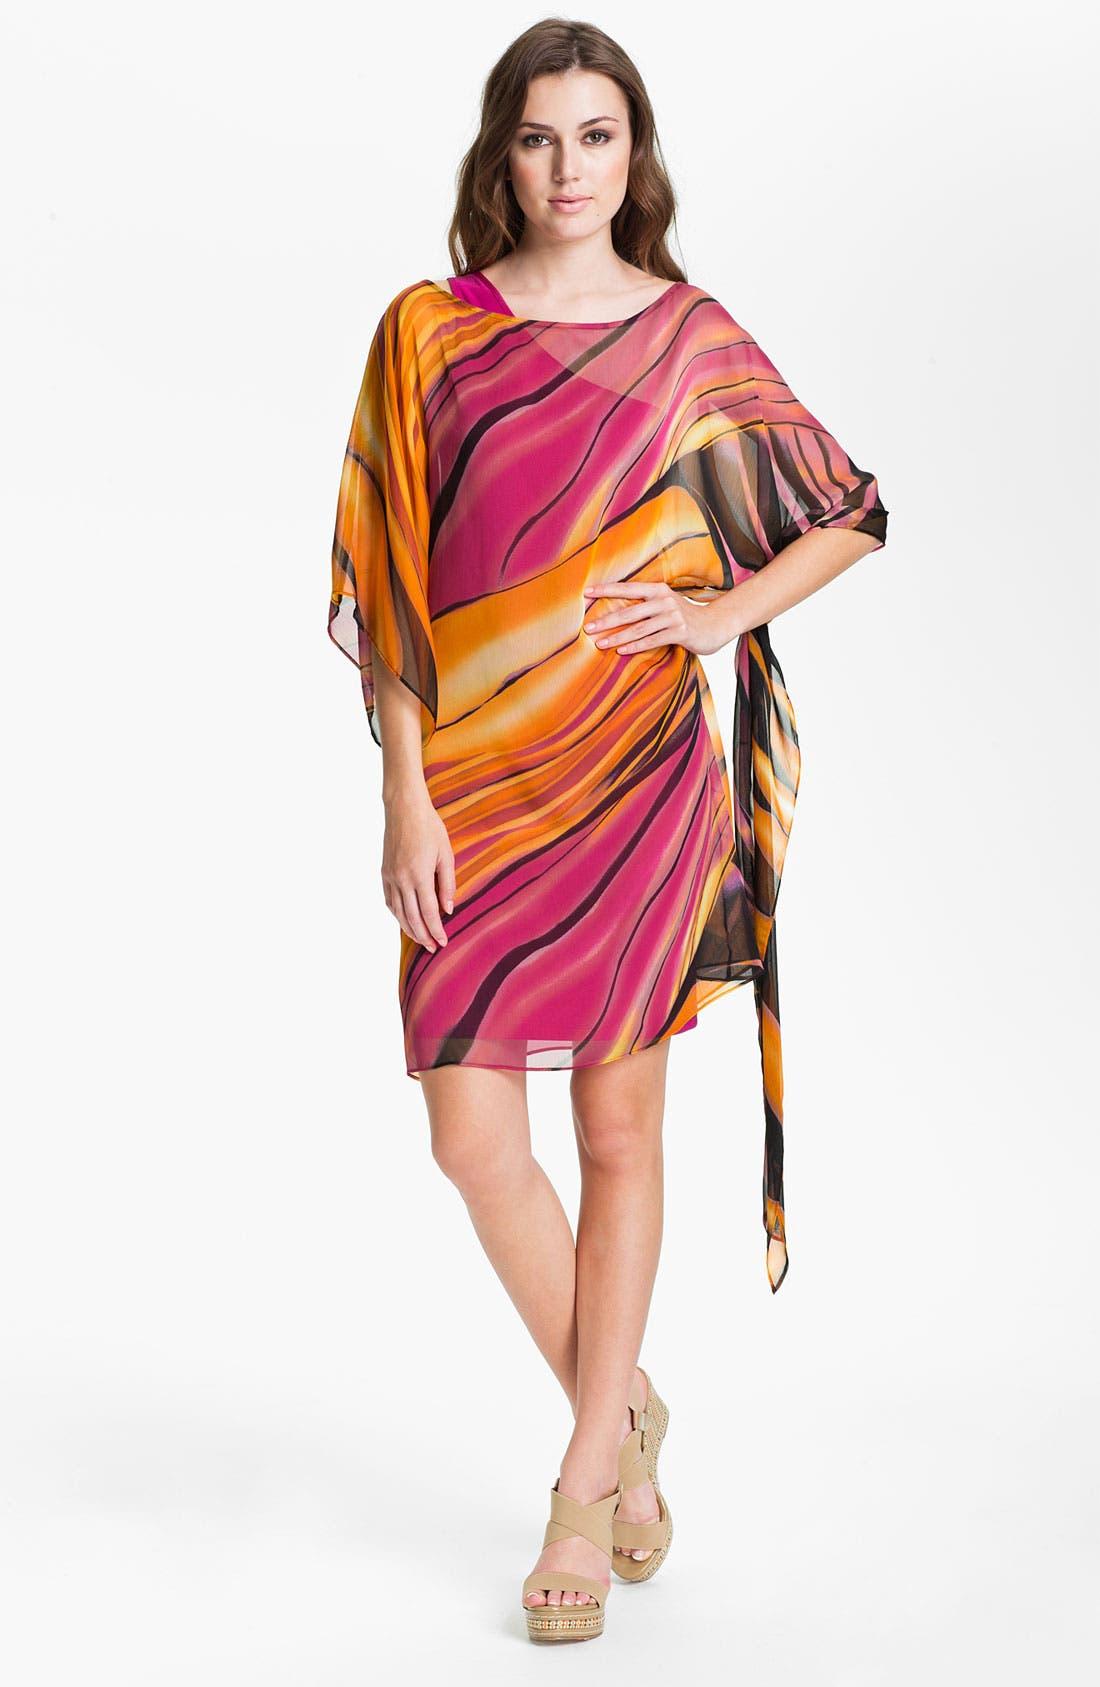 Alternate Image 1 Selected - Abi Ferrin 'Nicola' Convertible Chiffon Dress